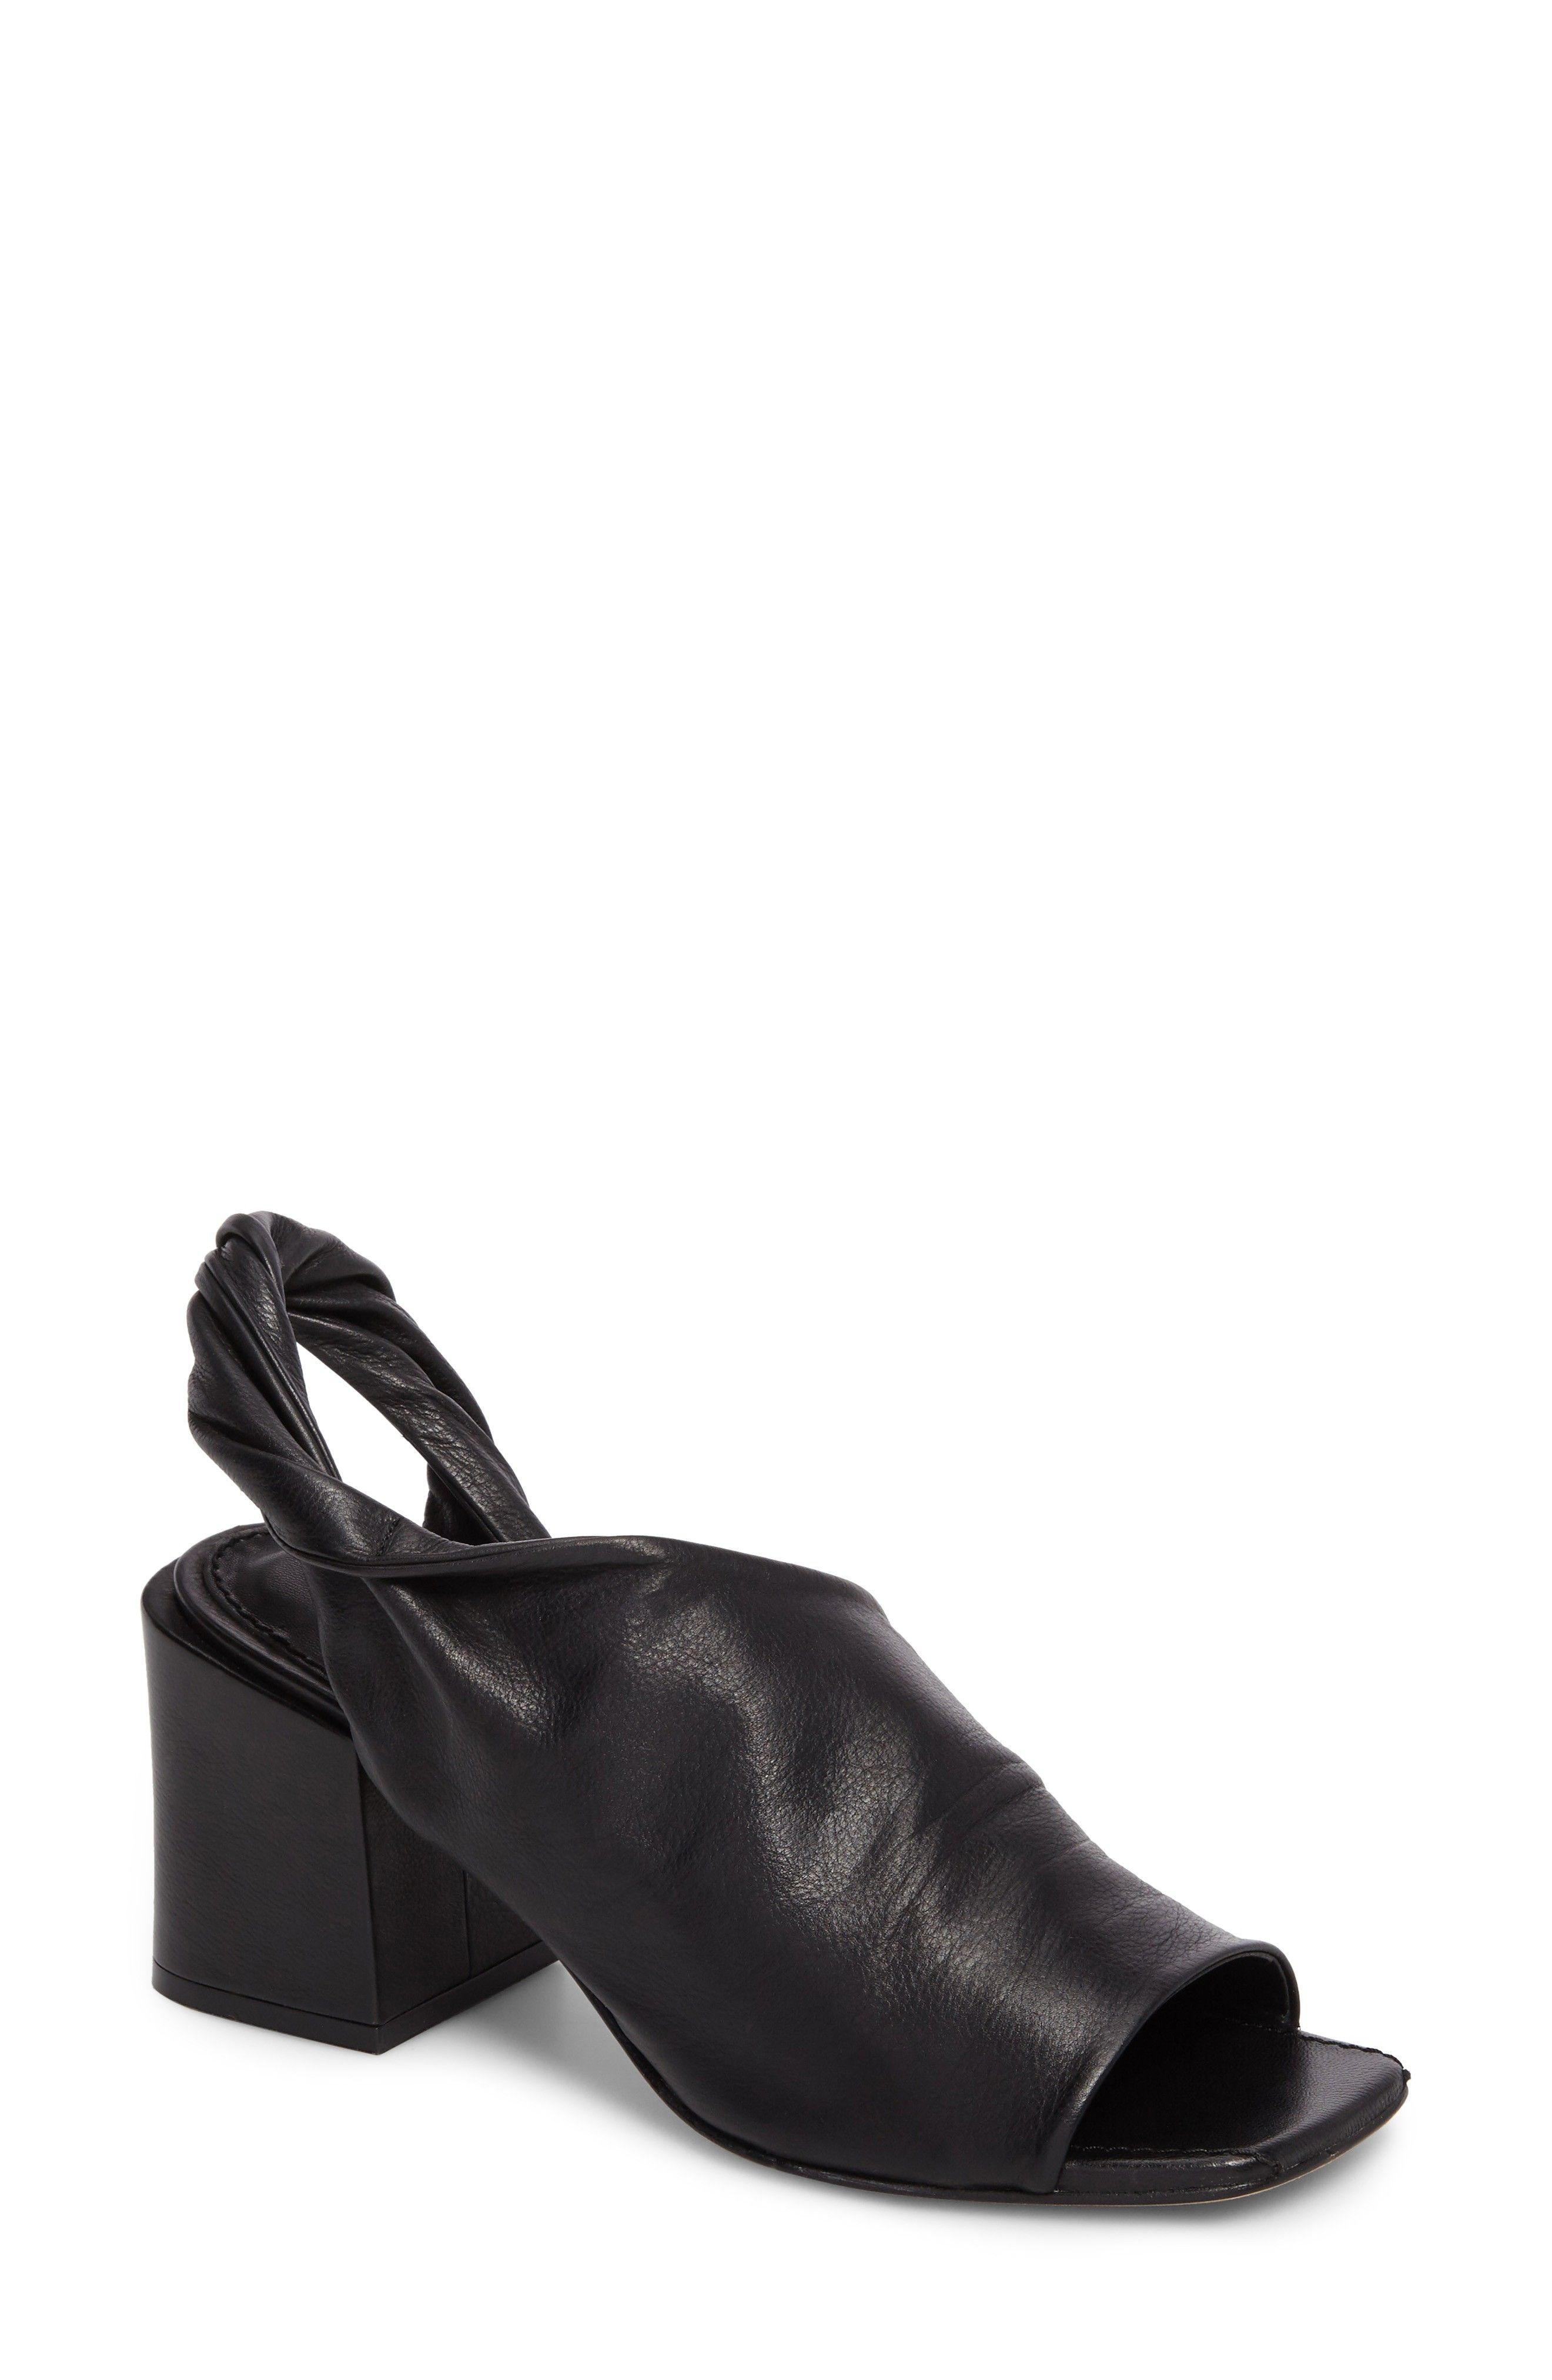 5f83183b69ca Buy SIGERSON MORRISON Lenny Block Heel Sandal for shopping. New SIGERSON  MORRISON Shoes.